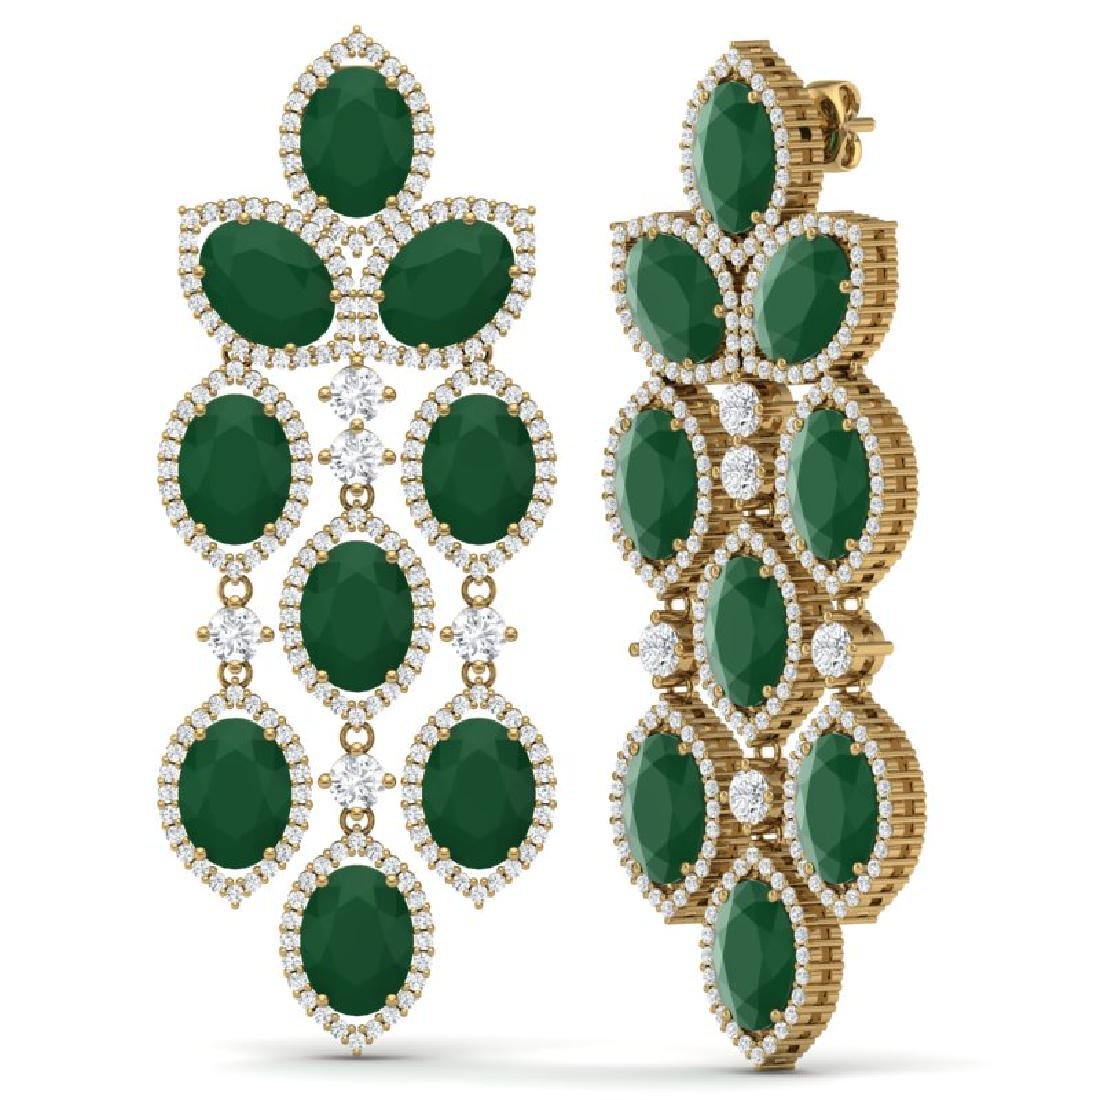 26.15 CTW Royalty Emerald & VS Diamond Earrings 18K - 3